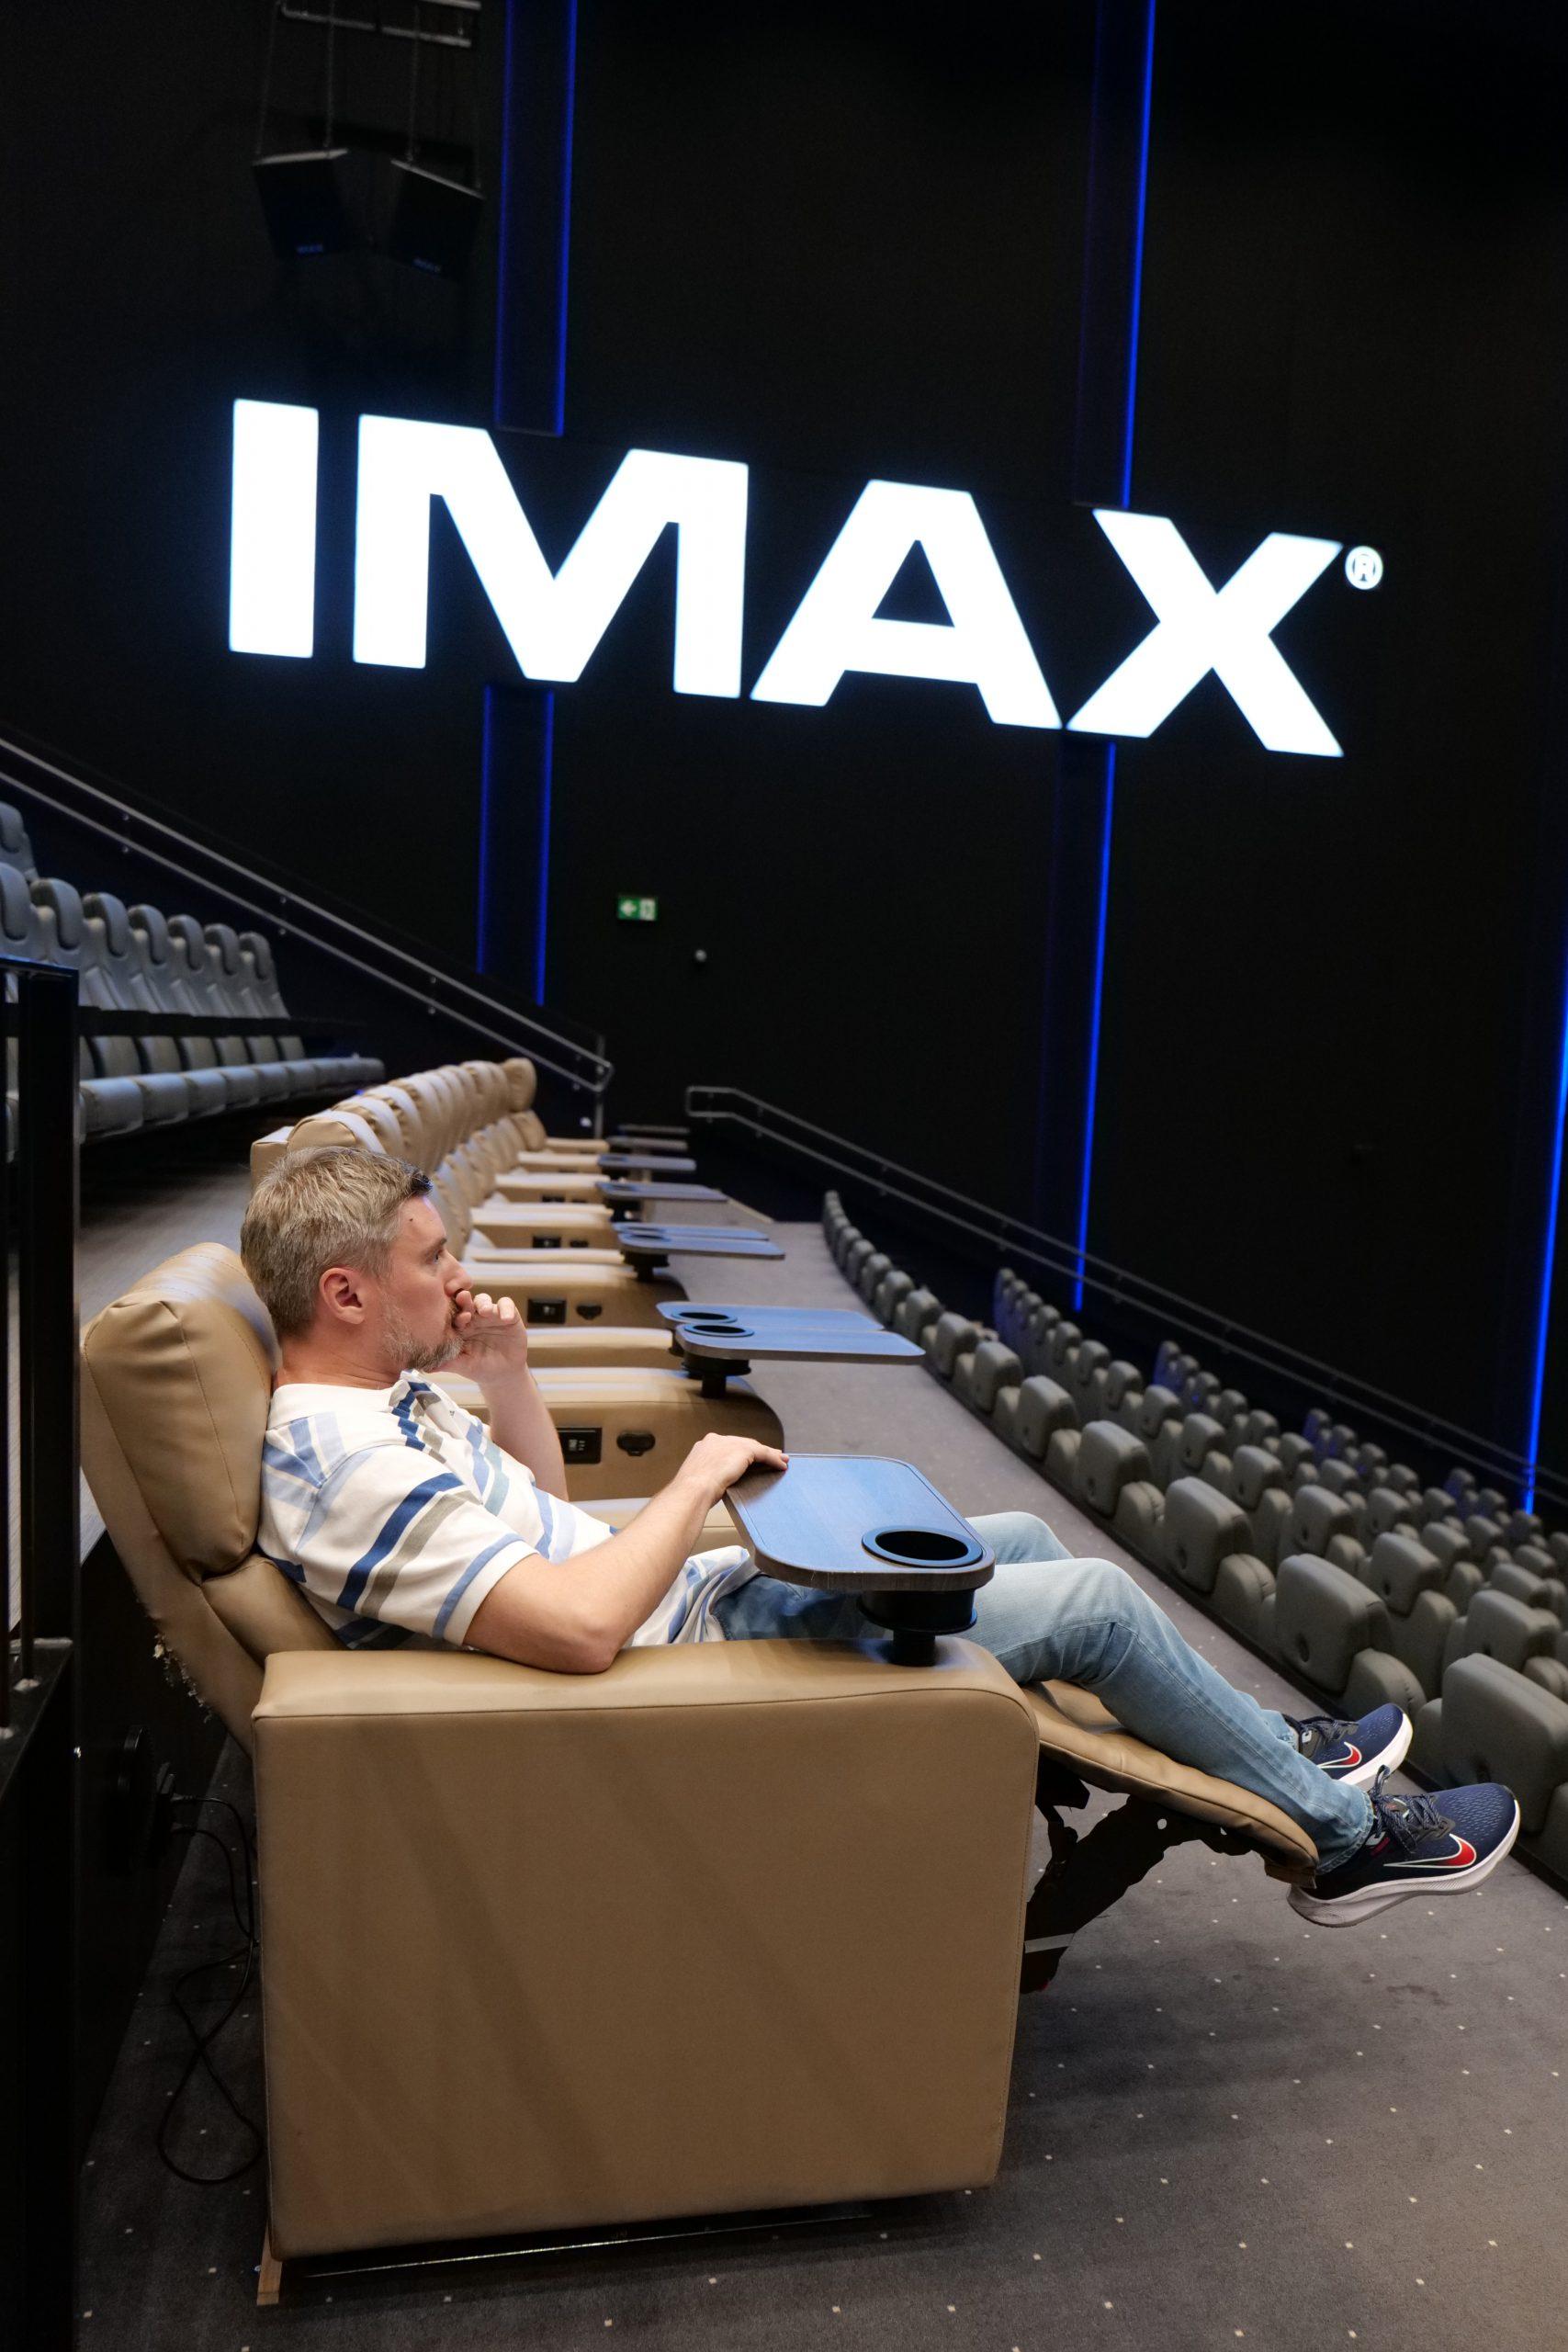 IMAX Odeon Oslo Audun Hage